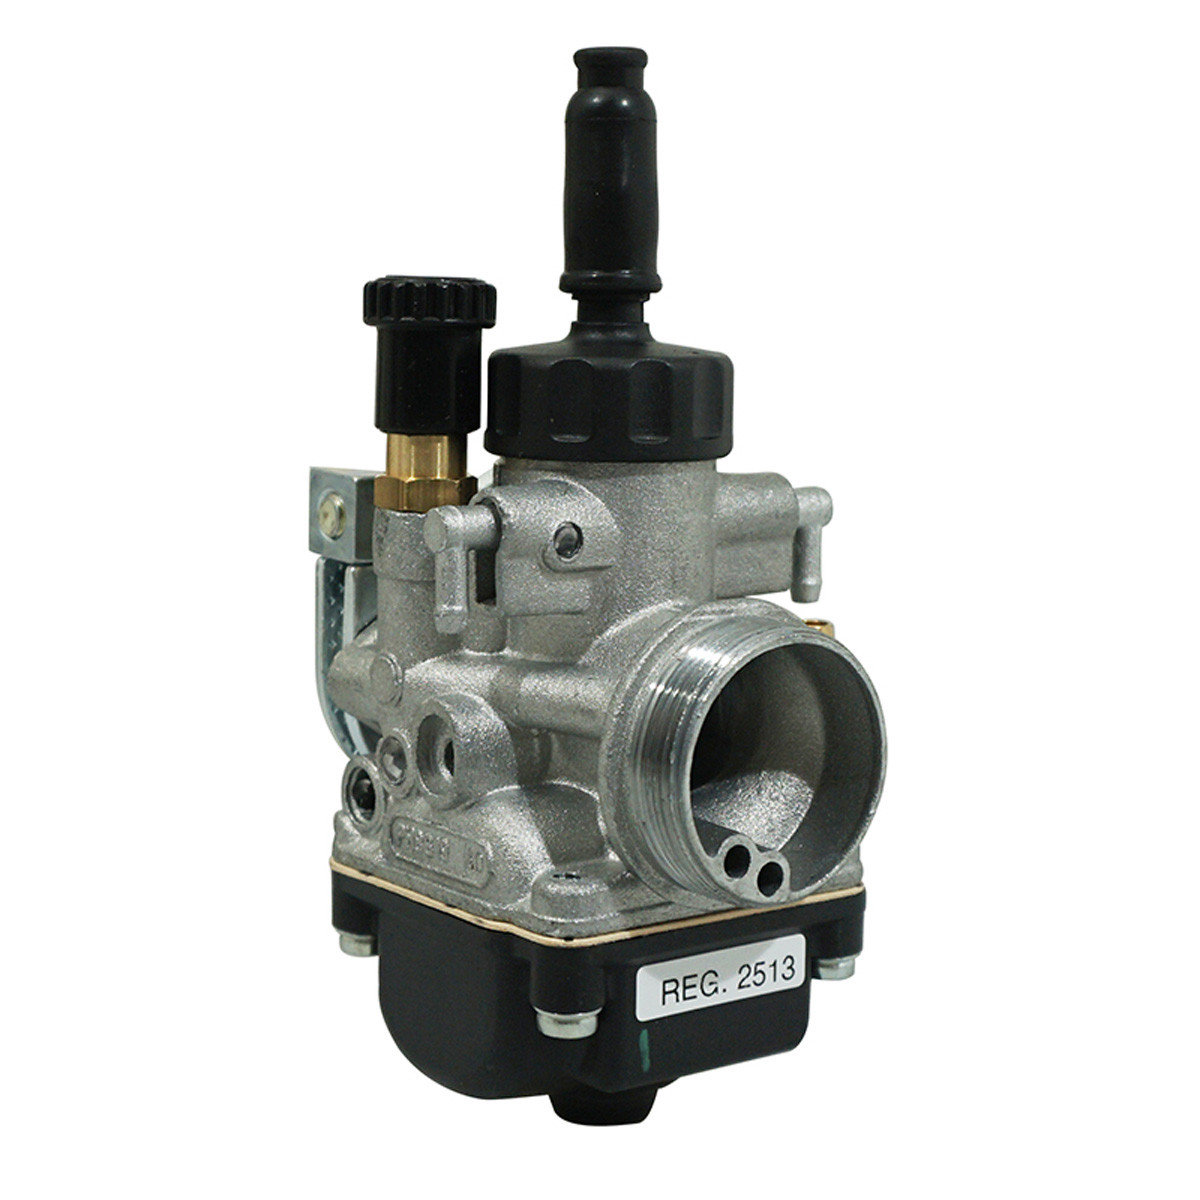 Carburateur 19mm PHBG AD - Dellorto Montage Rigide / Starter manuel / couvercle rond